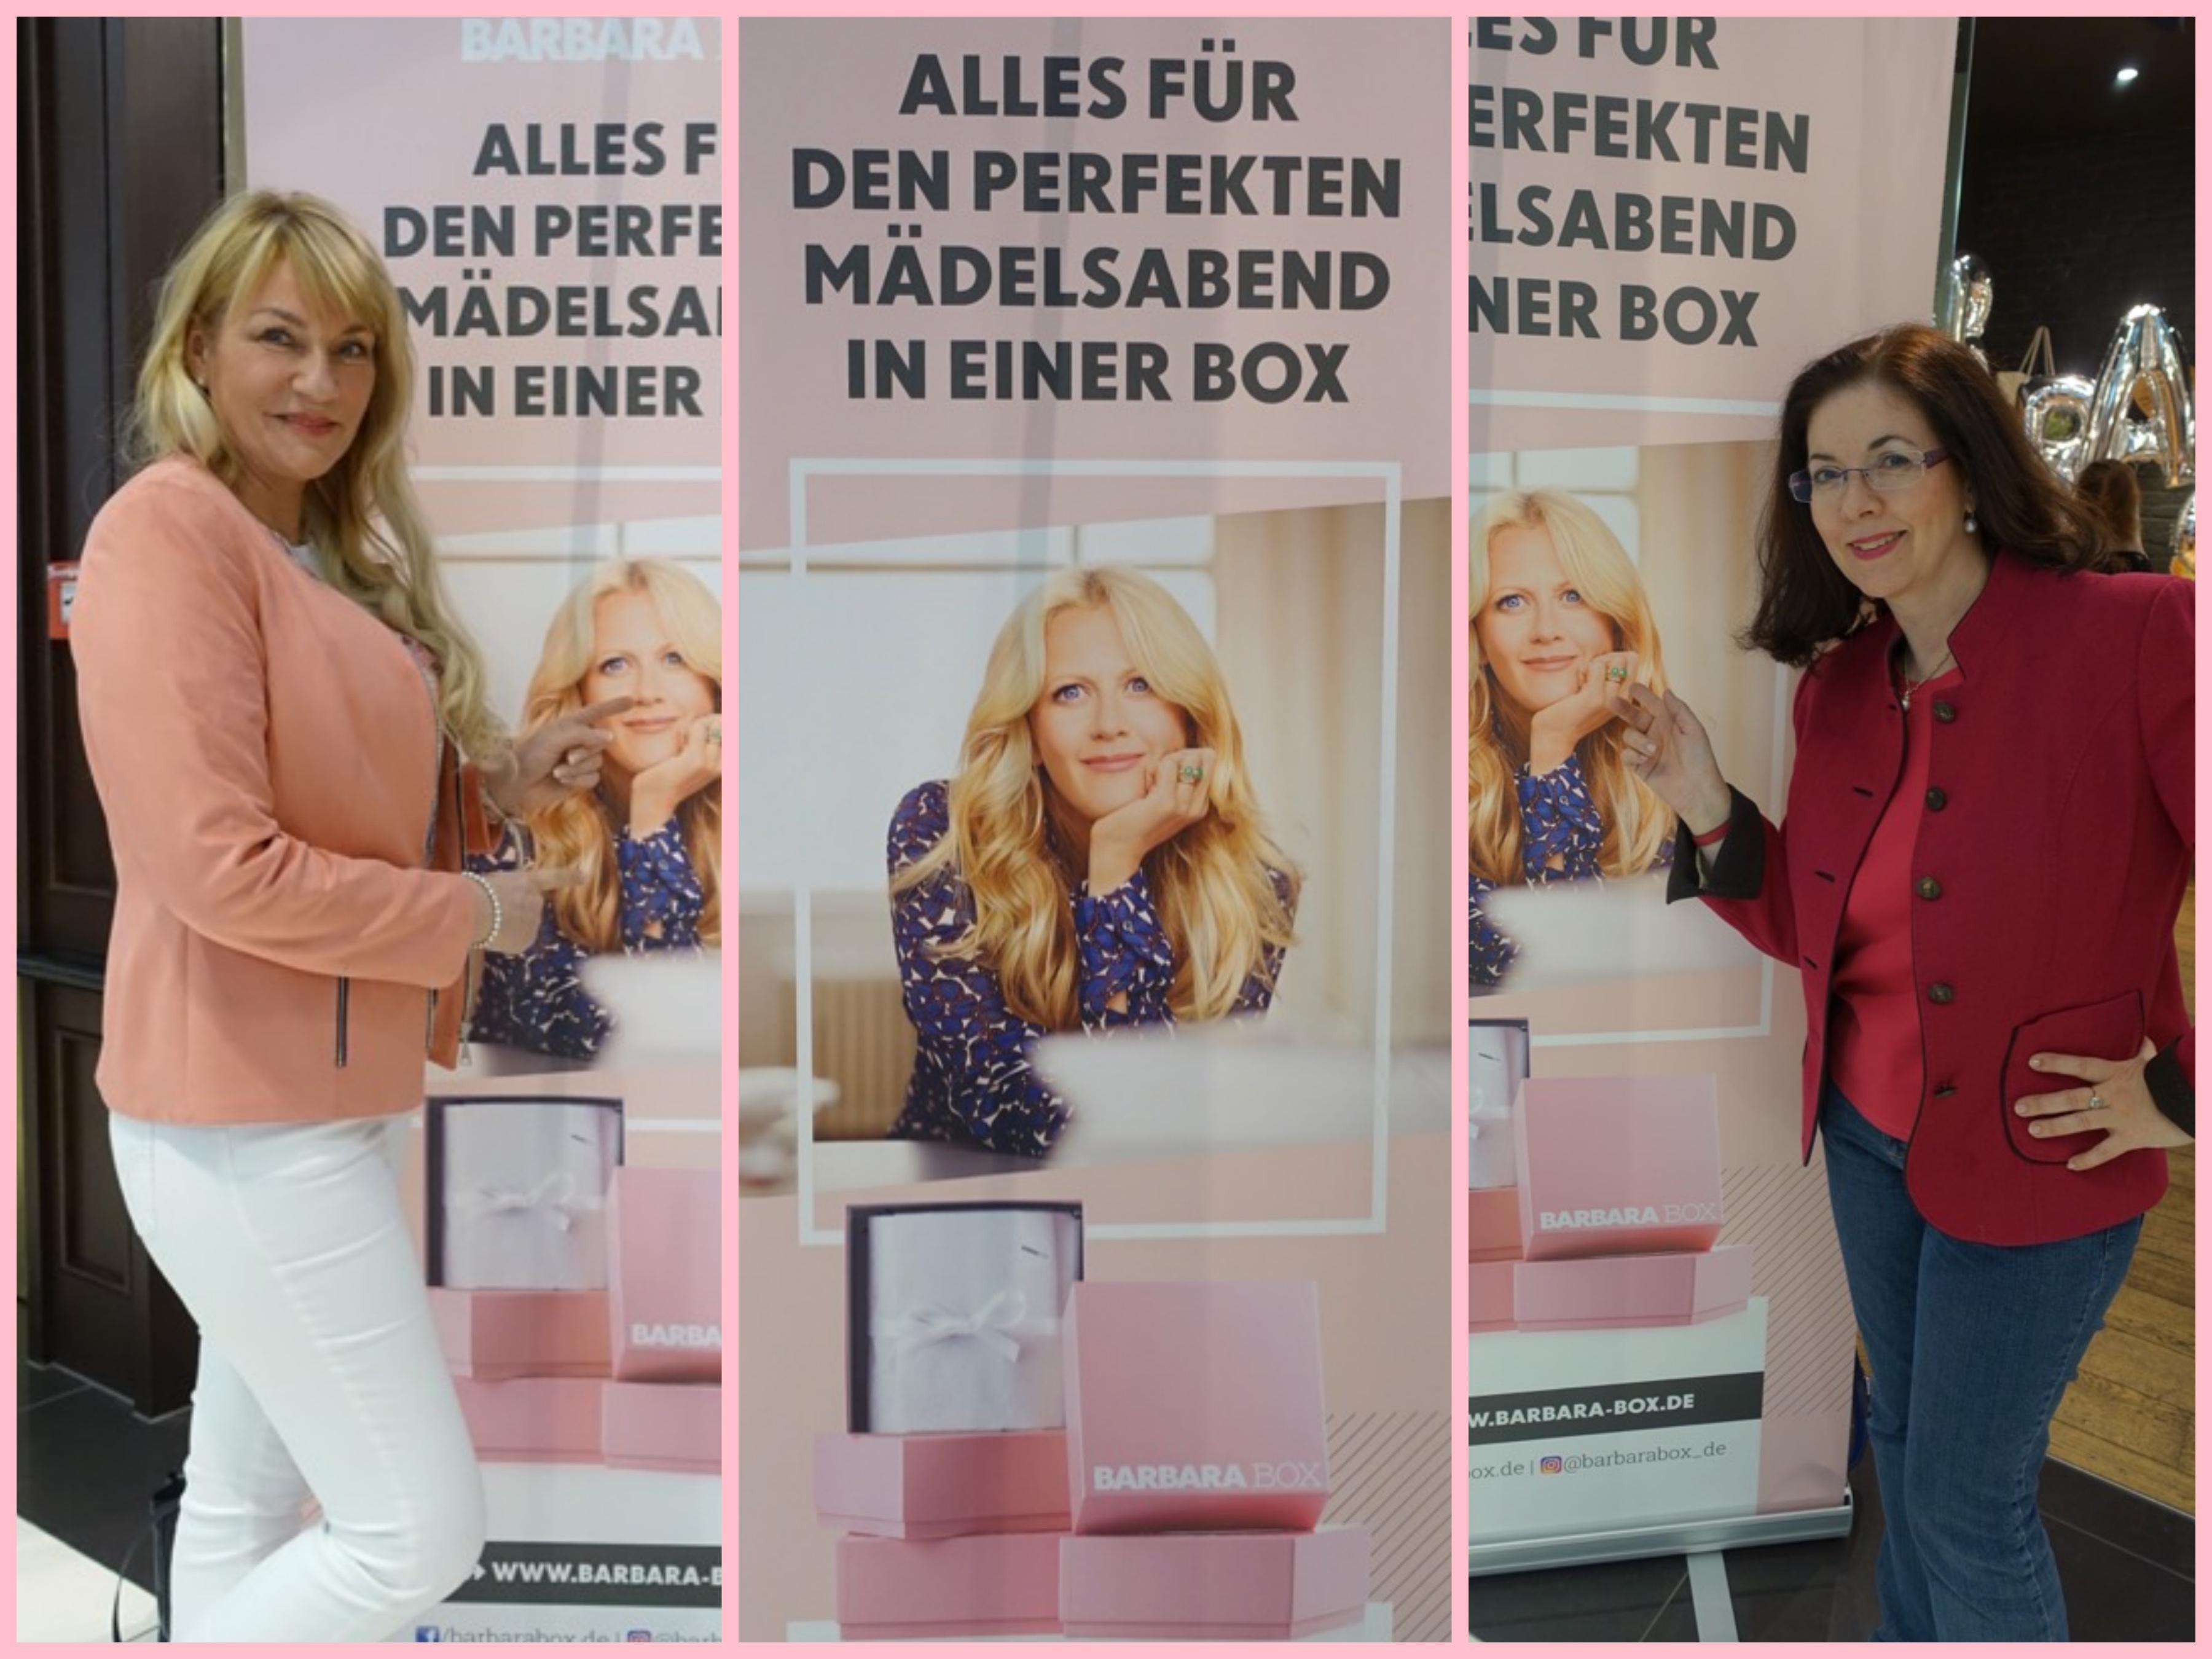 Barbara-Box-Event-Berlin-HappyFace313